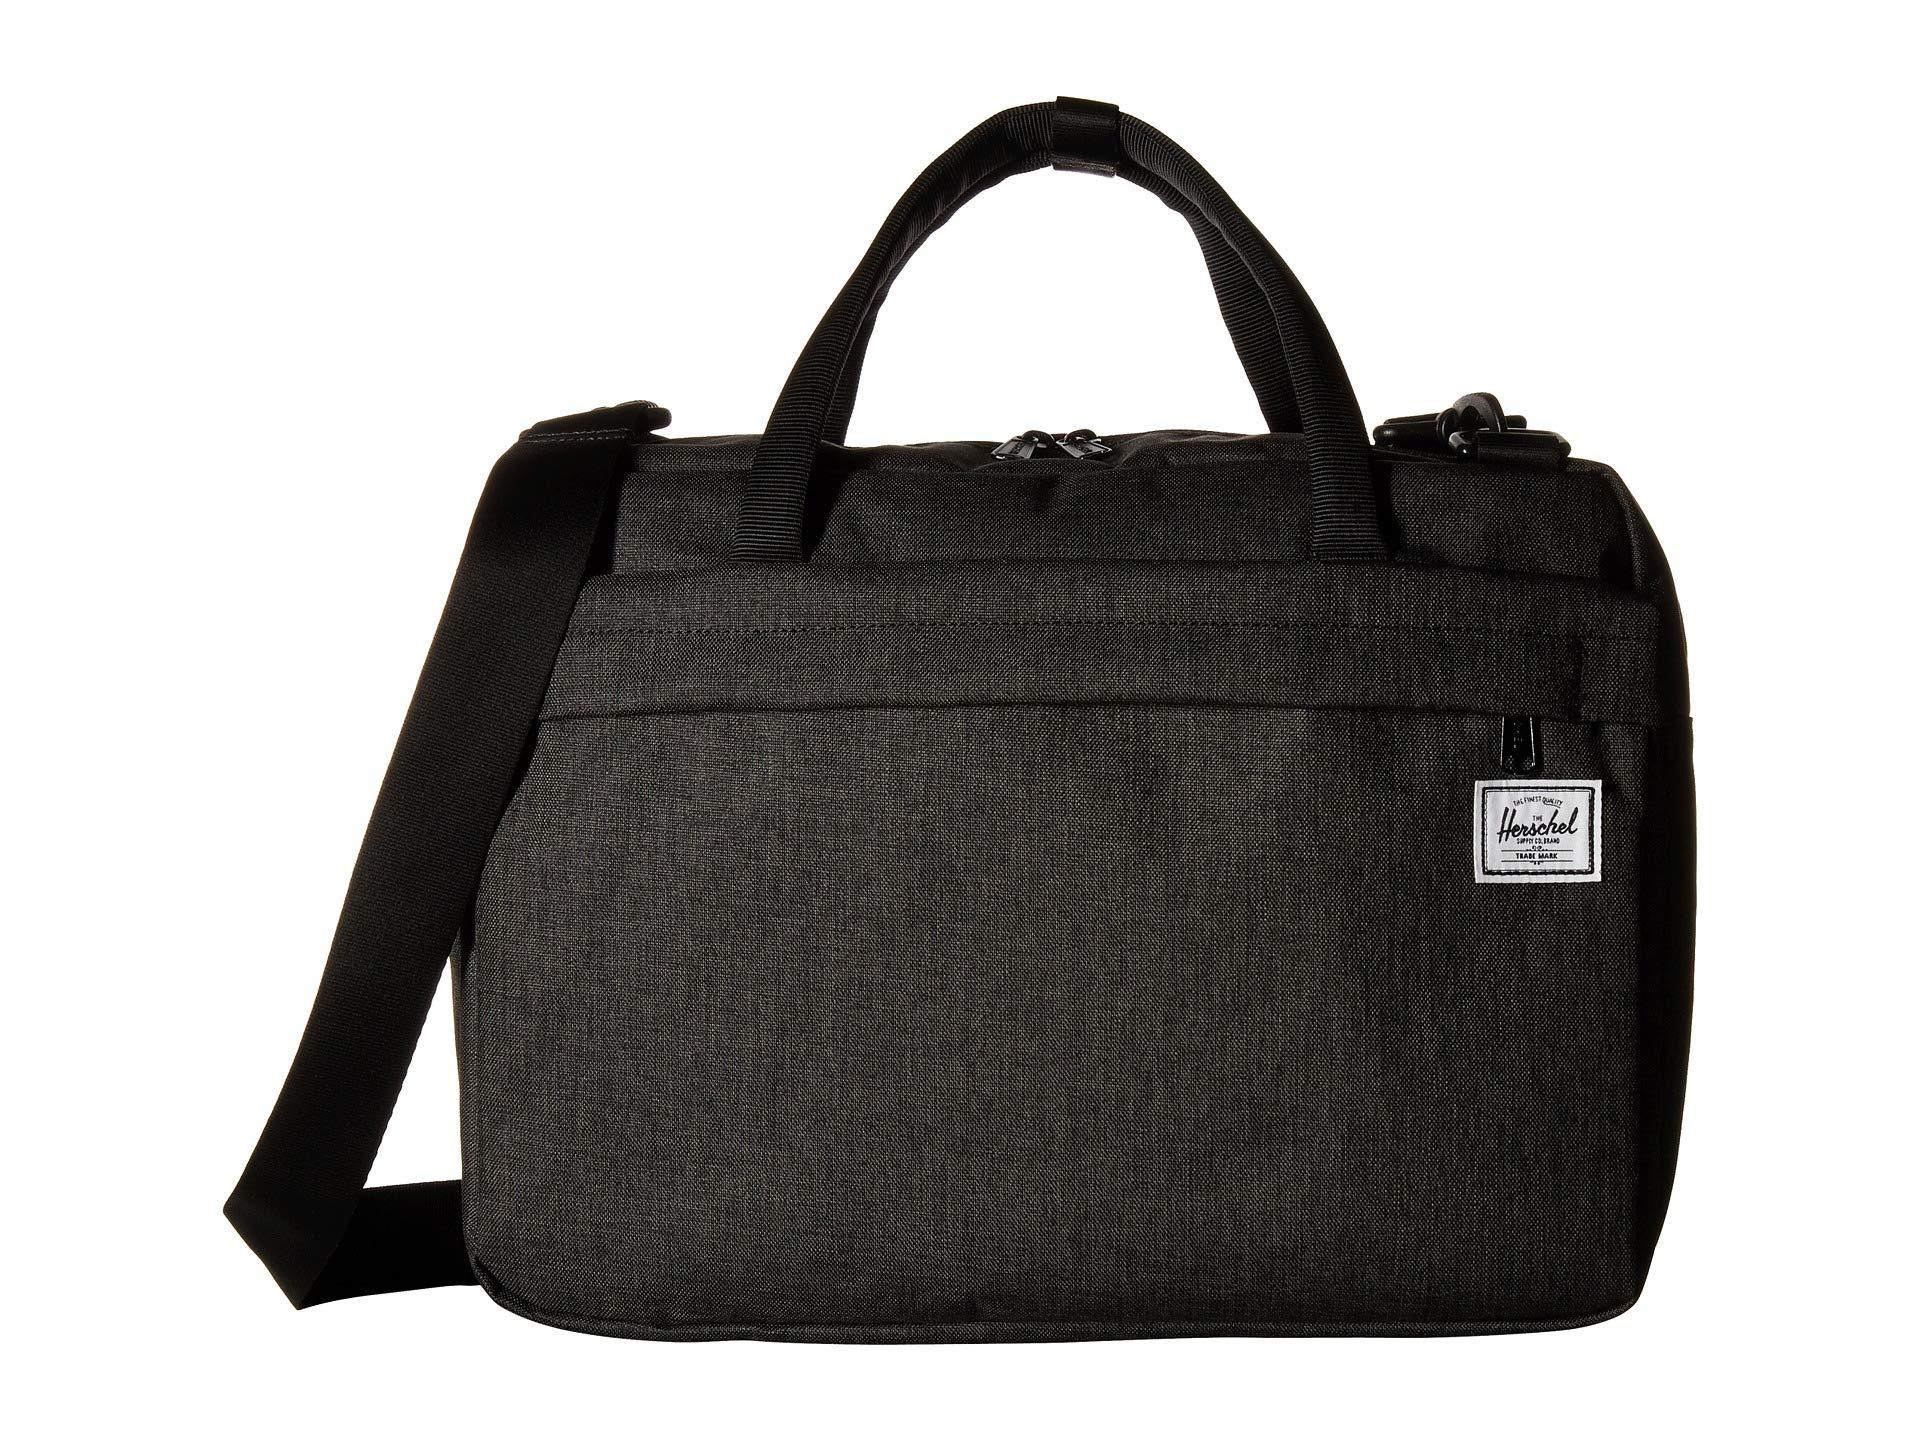 Herschel Gibson Laptop Messenger Bag Black Crosshatch One Size